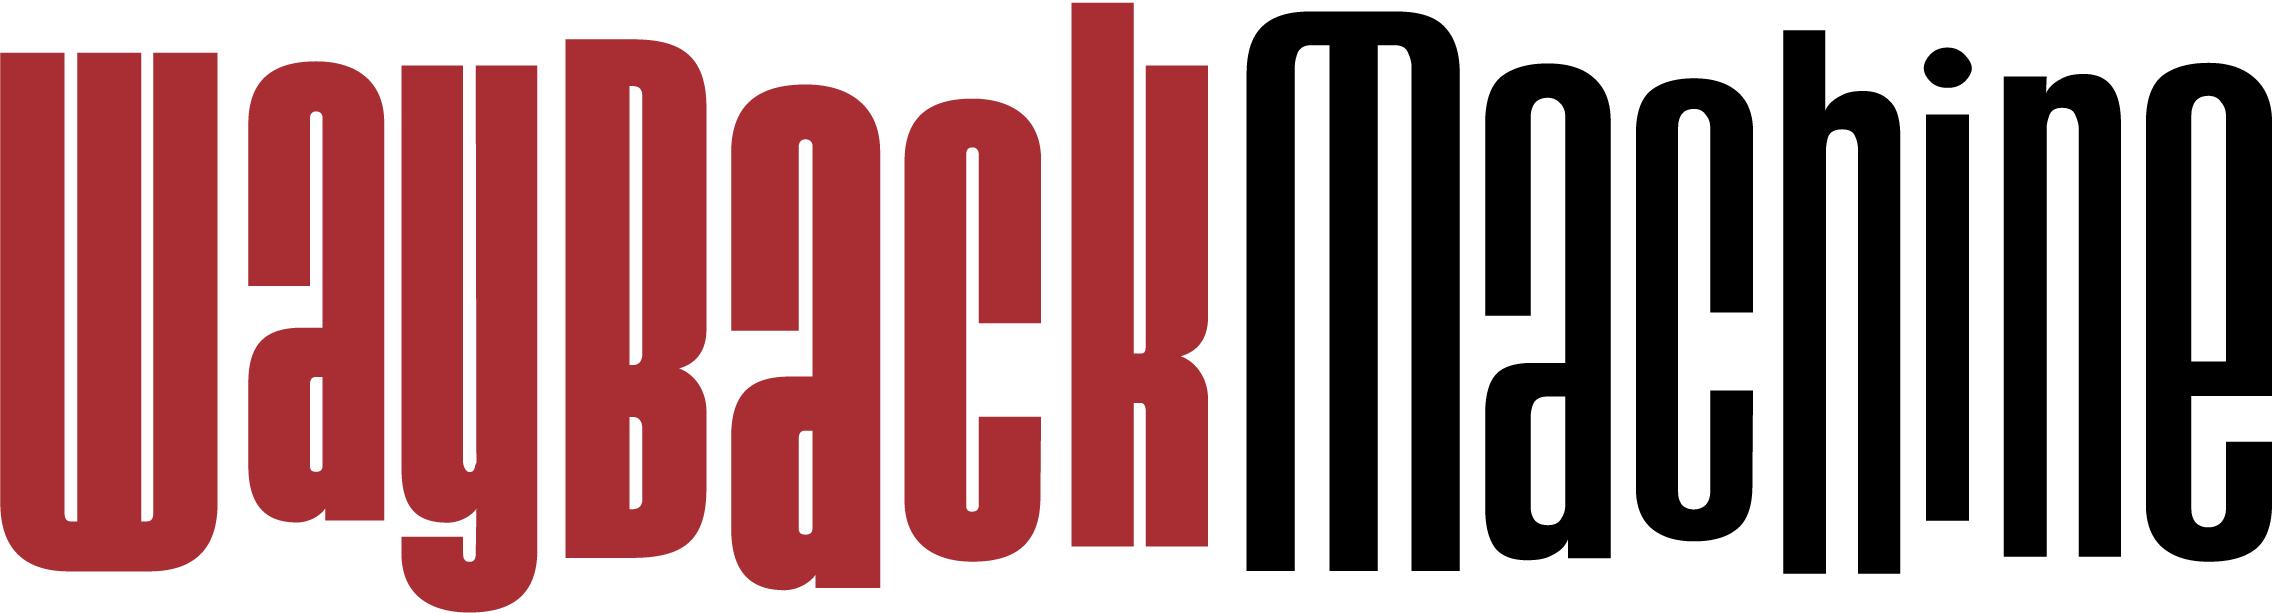 waybackmachine.png